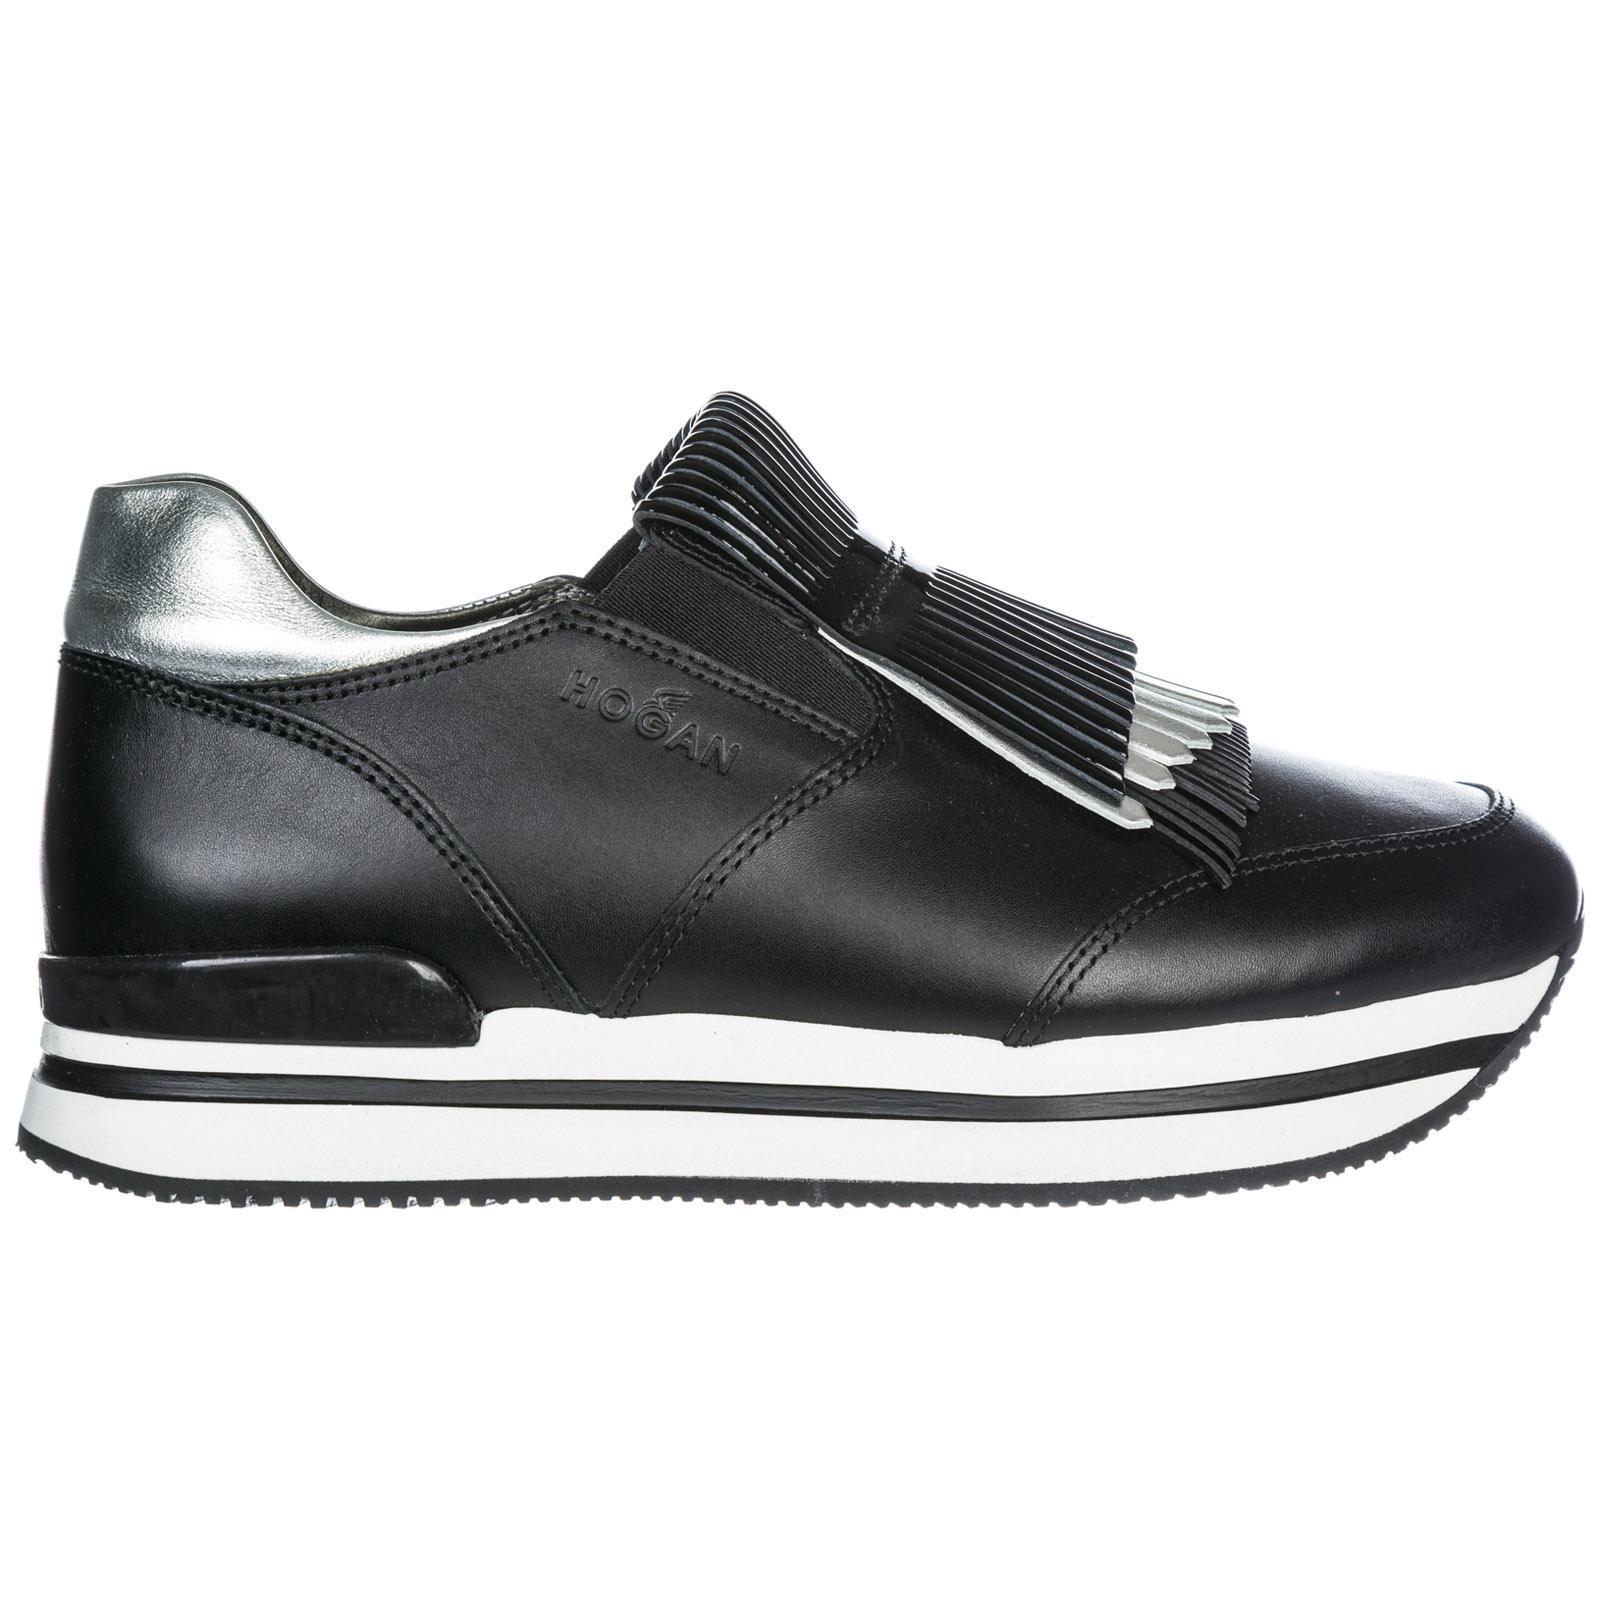 Hogan Women's Leather Slip On Sneakers  H222 In Black